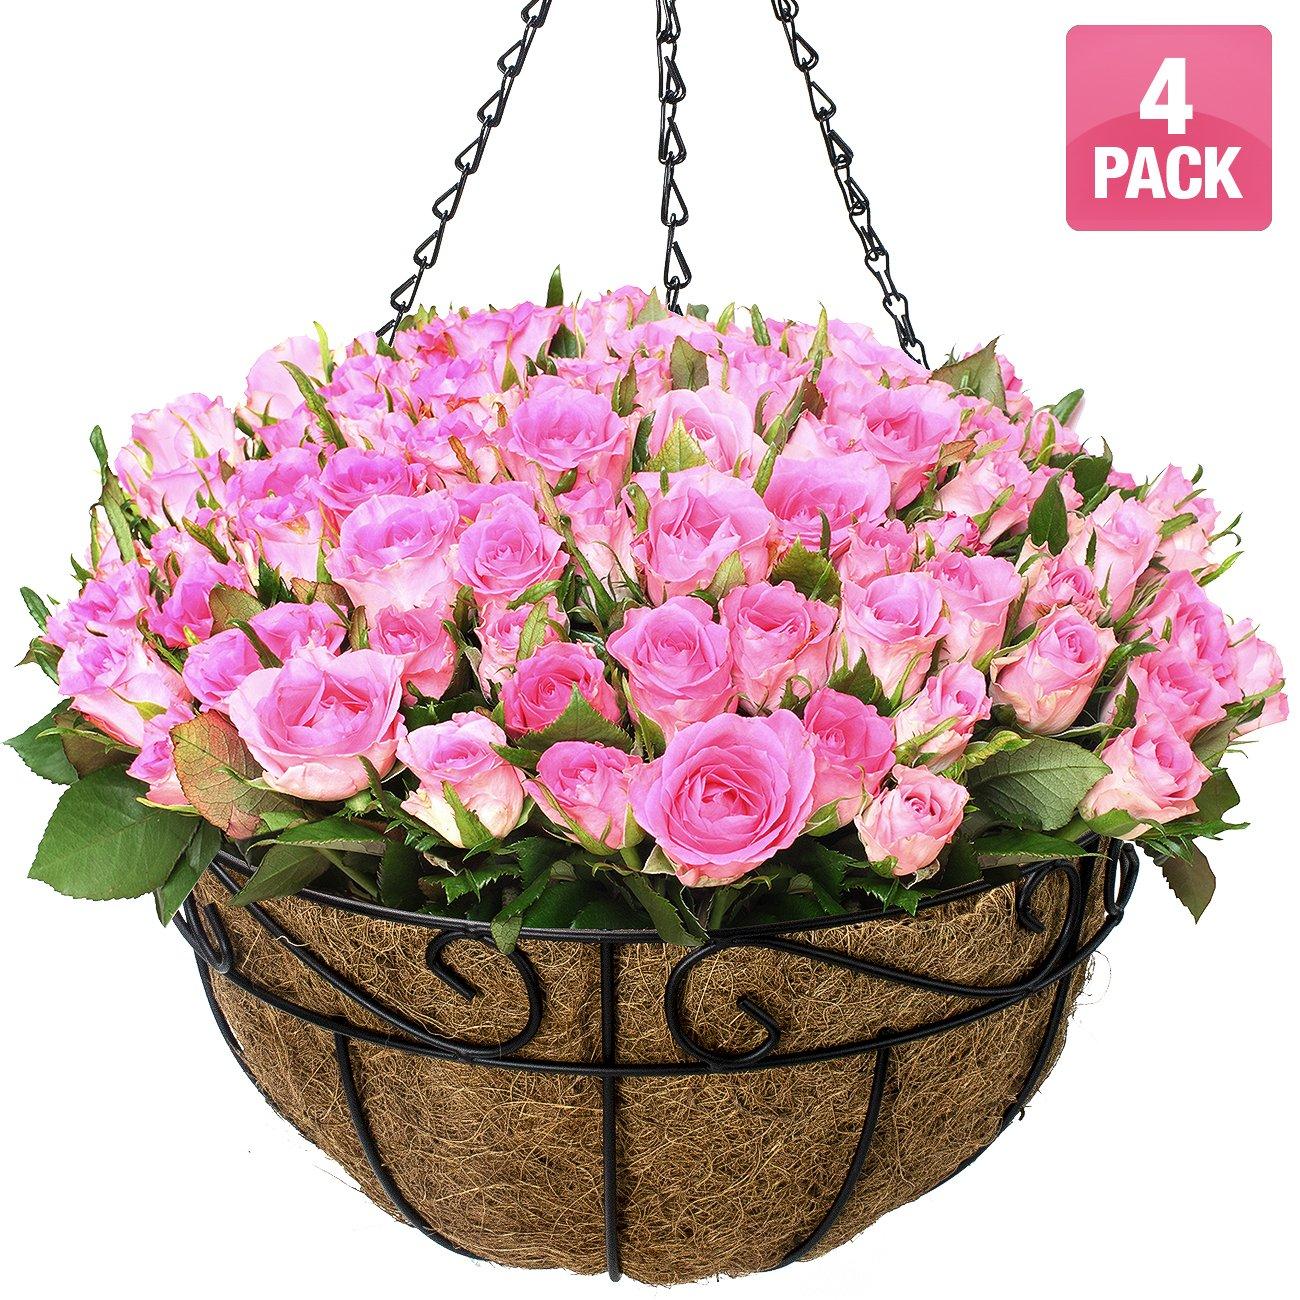 Sorbus Planter Basket Set, Hanging Flower Pot Basket & Liner for Indoor/Outdoor Garden Décor, Perfect for Home, Garden, Patio, Deck (4-Pack) by Sorbus